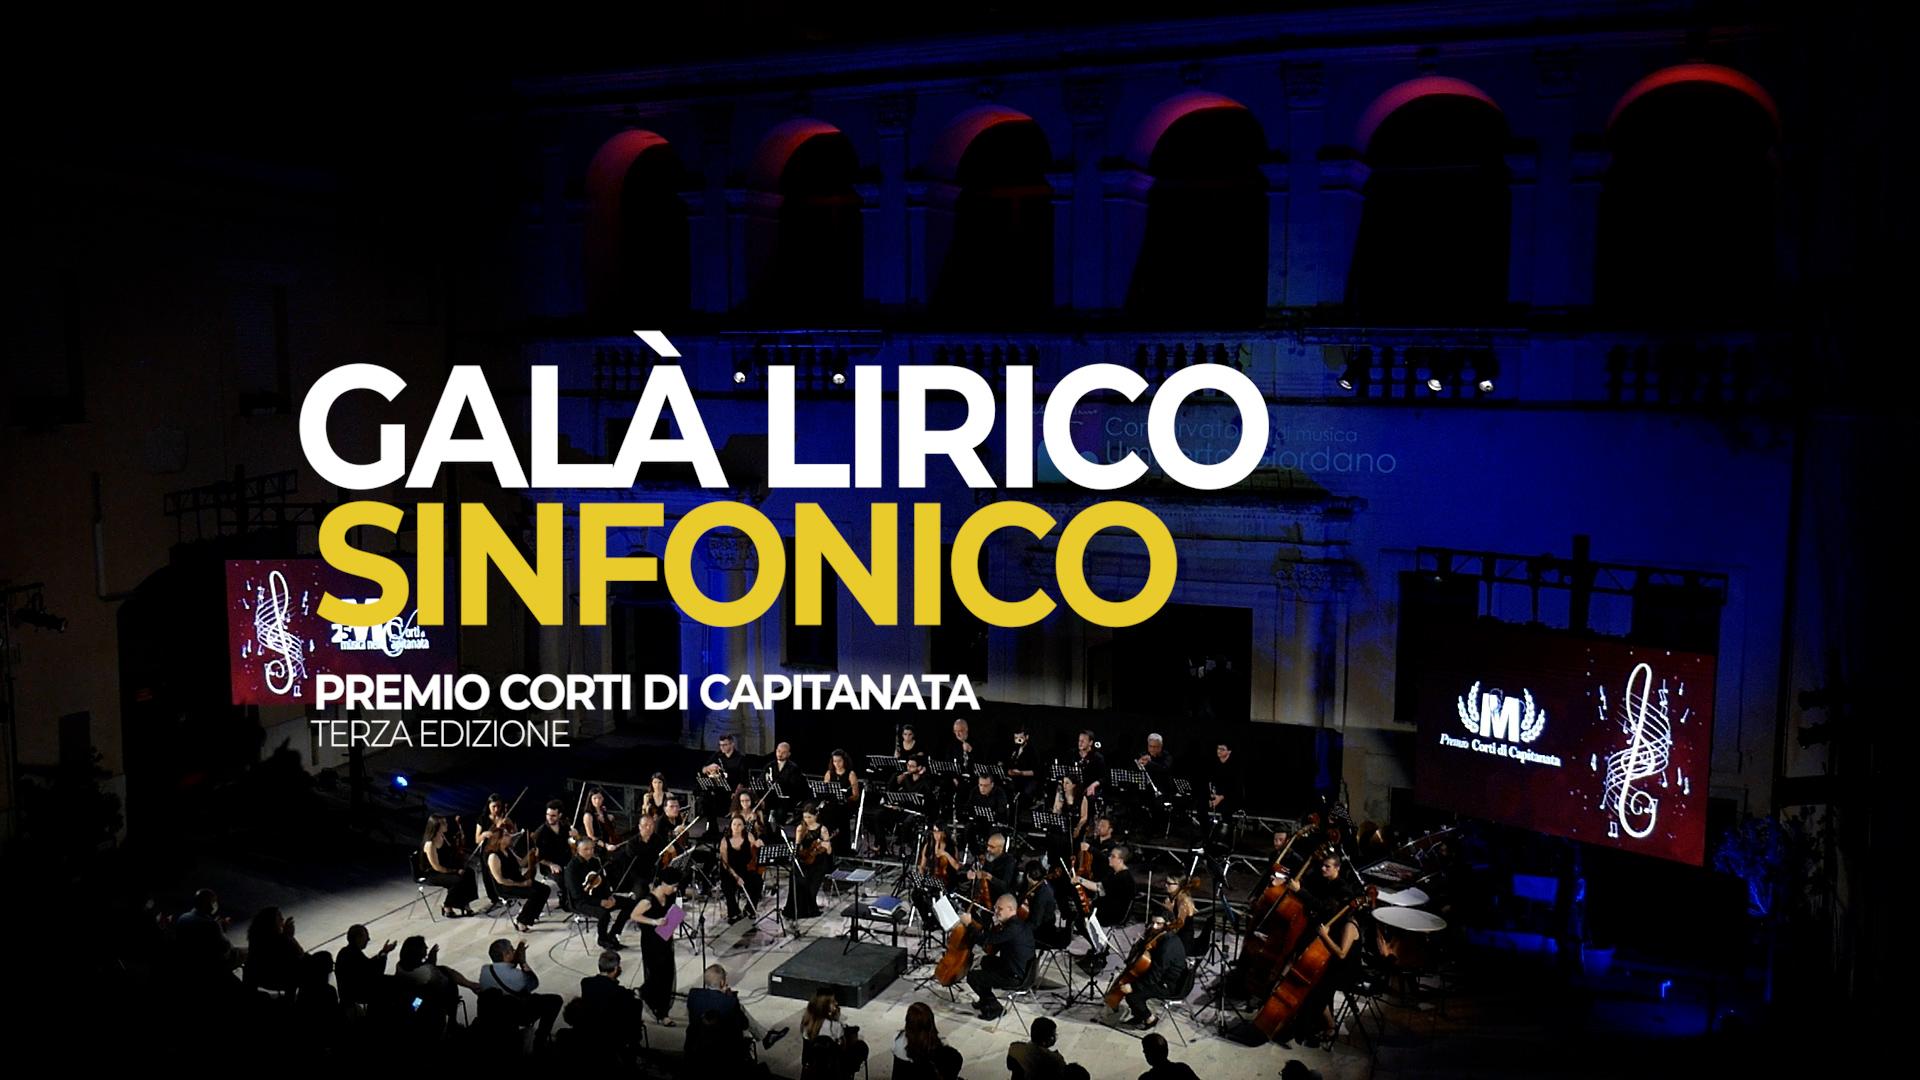 16 – 23/07 – Galà Lirico Sinfonico